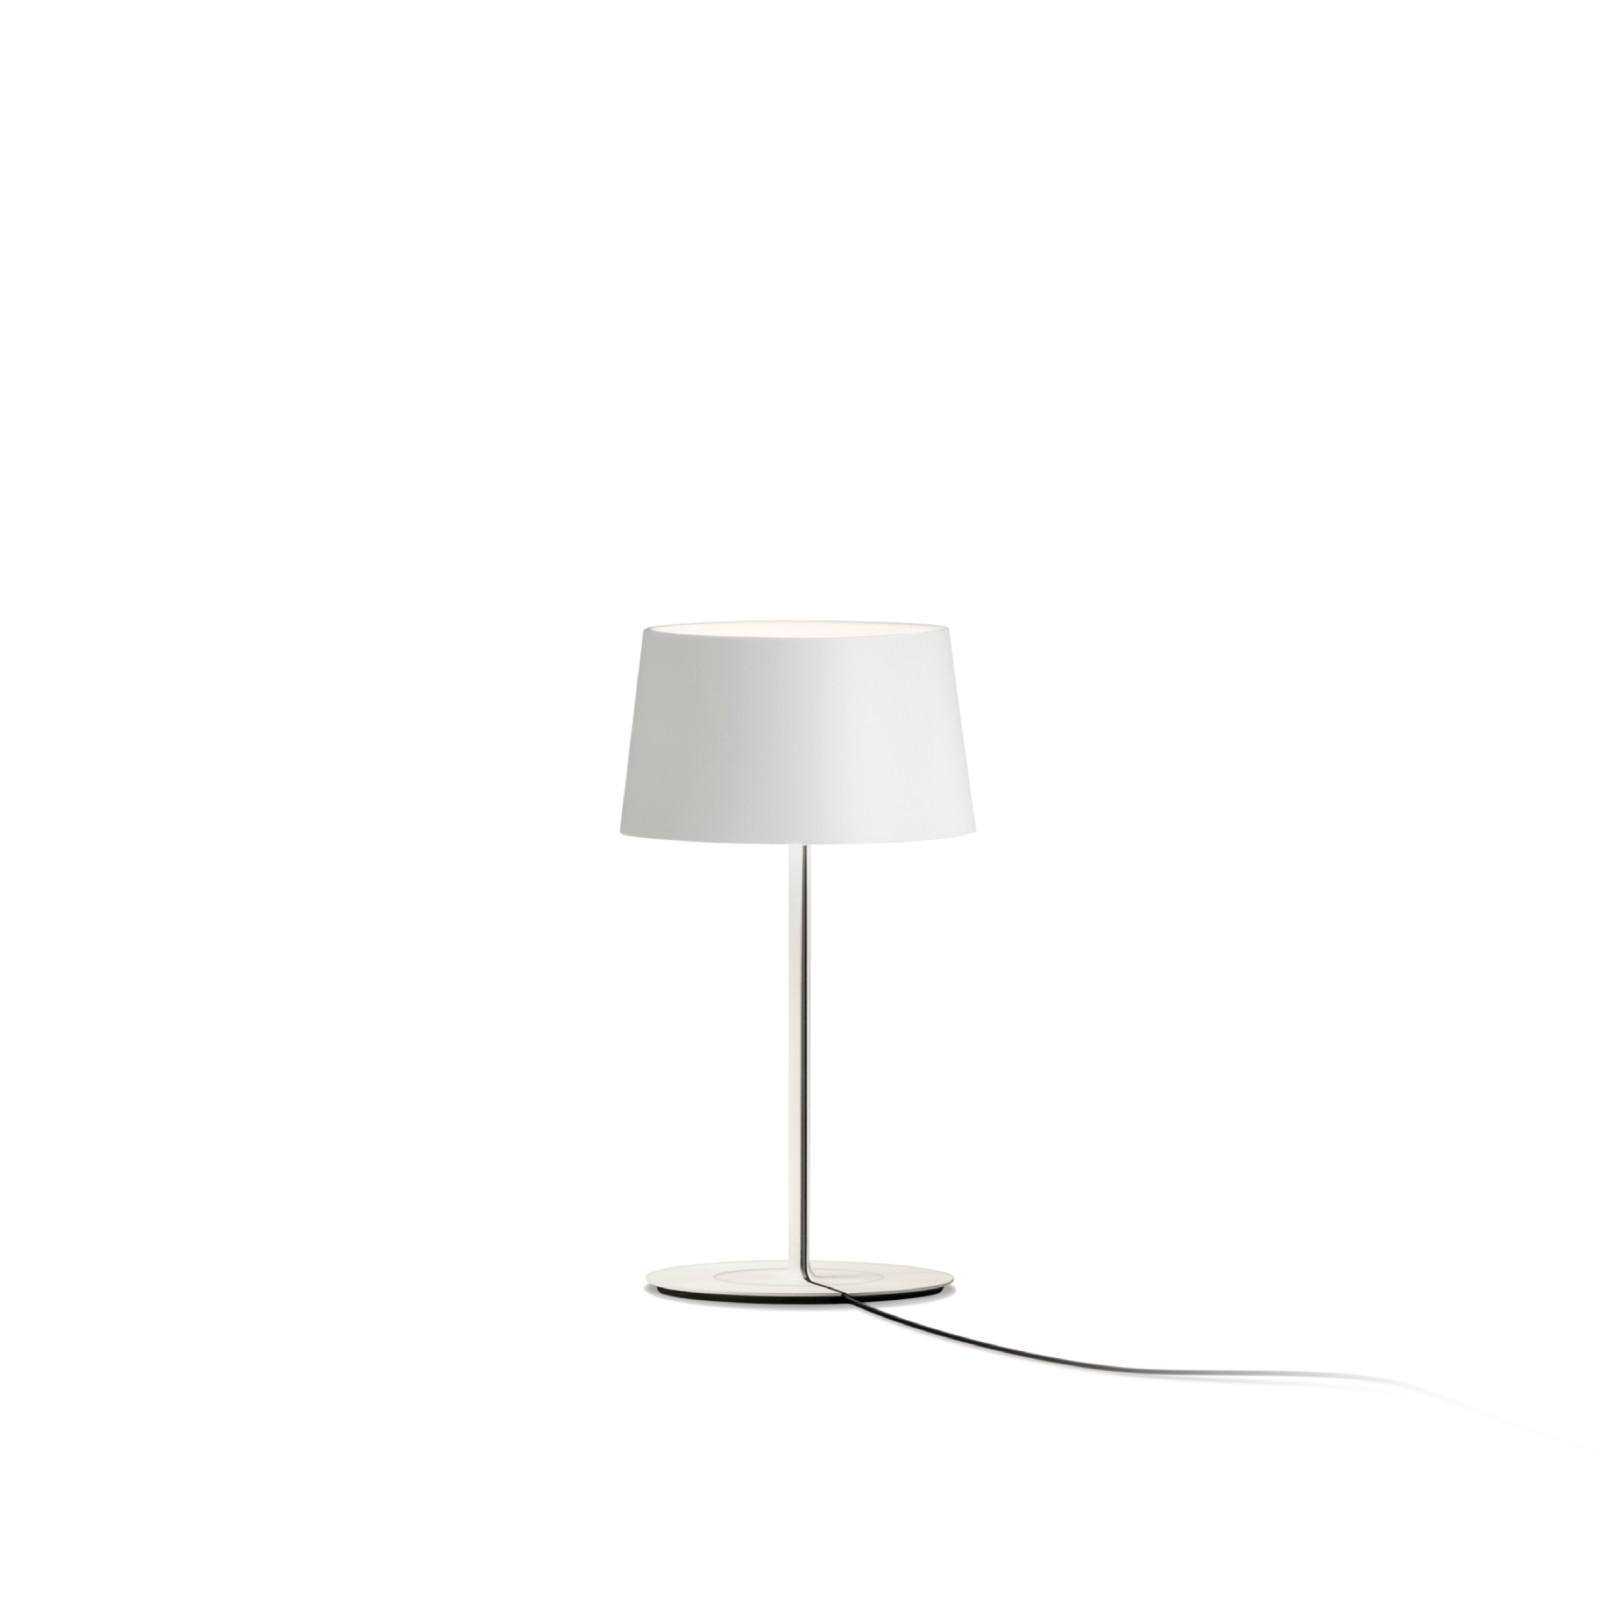 Warm Mini Table Lamp Off-white Matt Lacquer, Aluminium